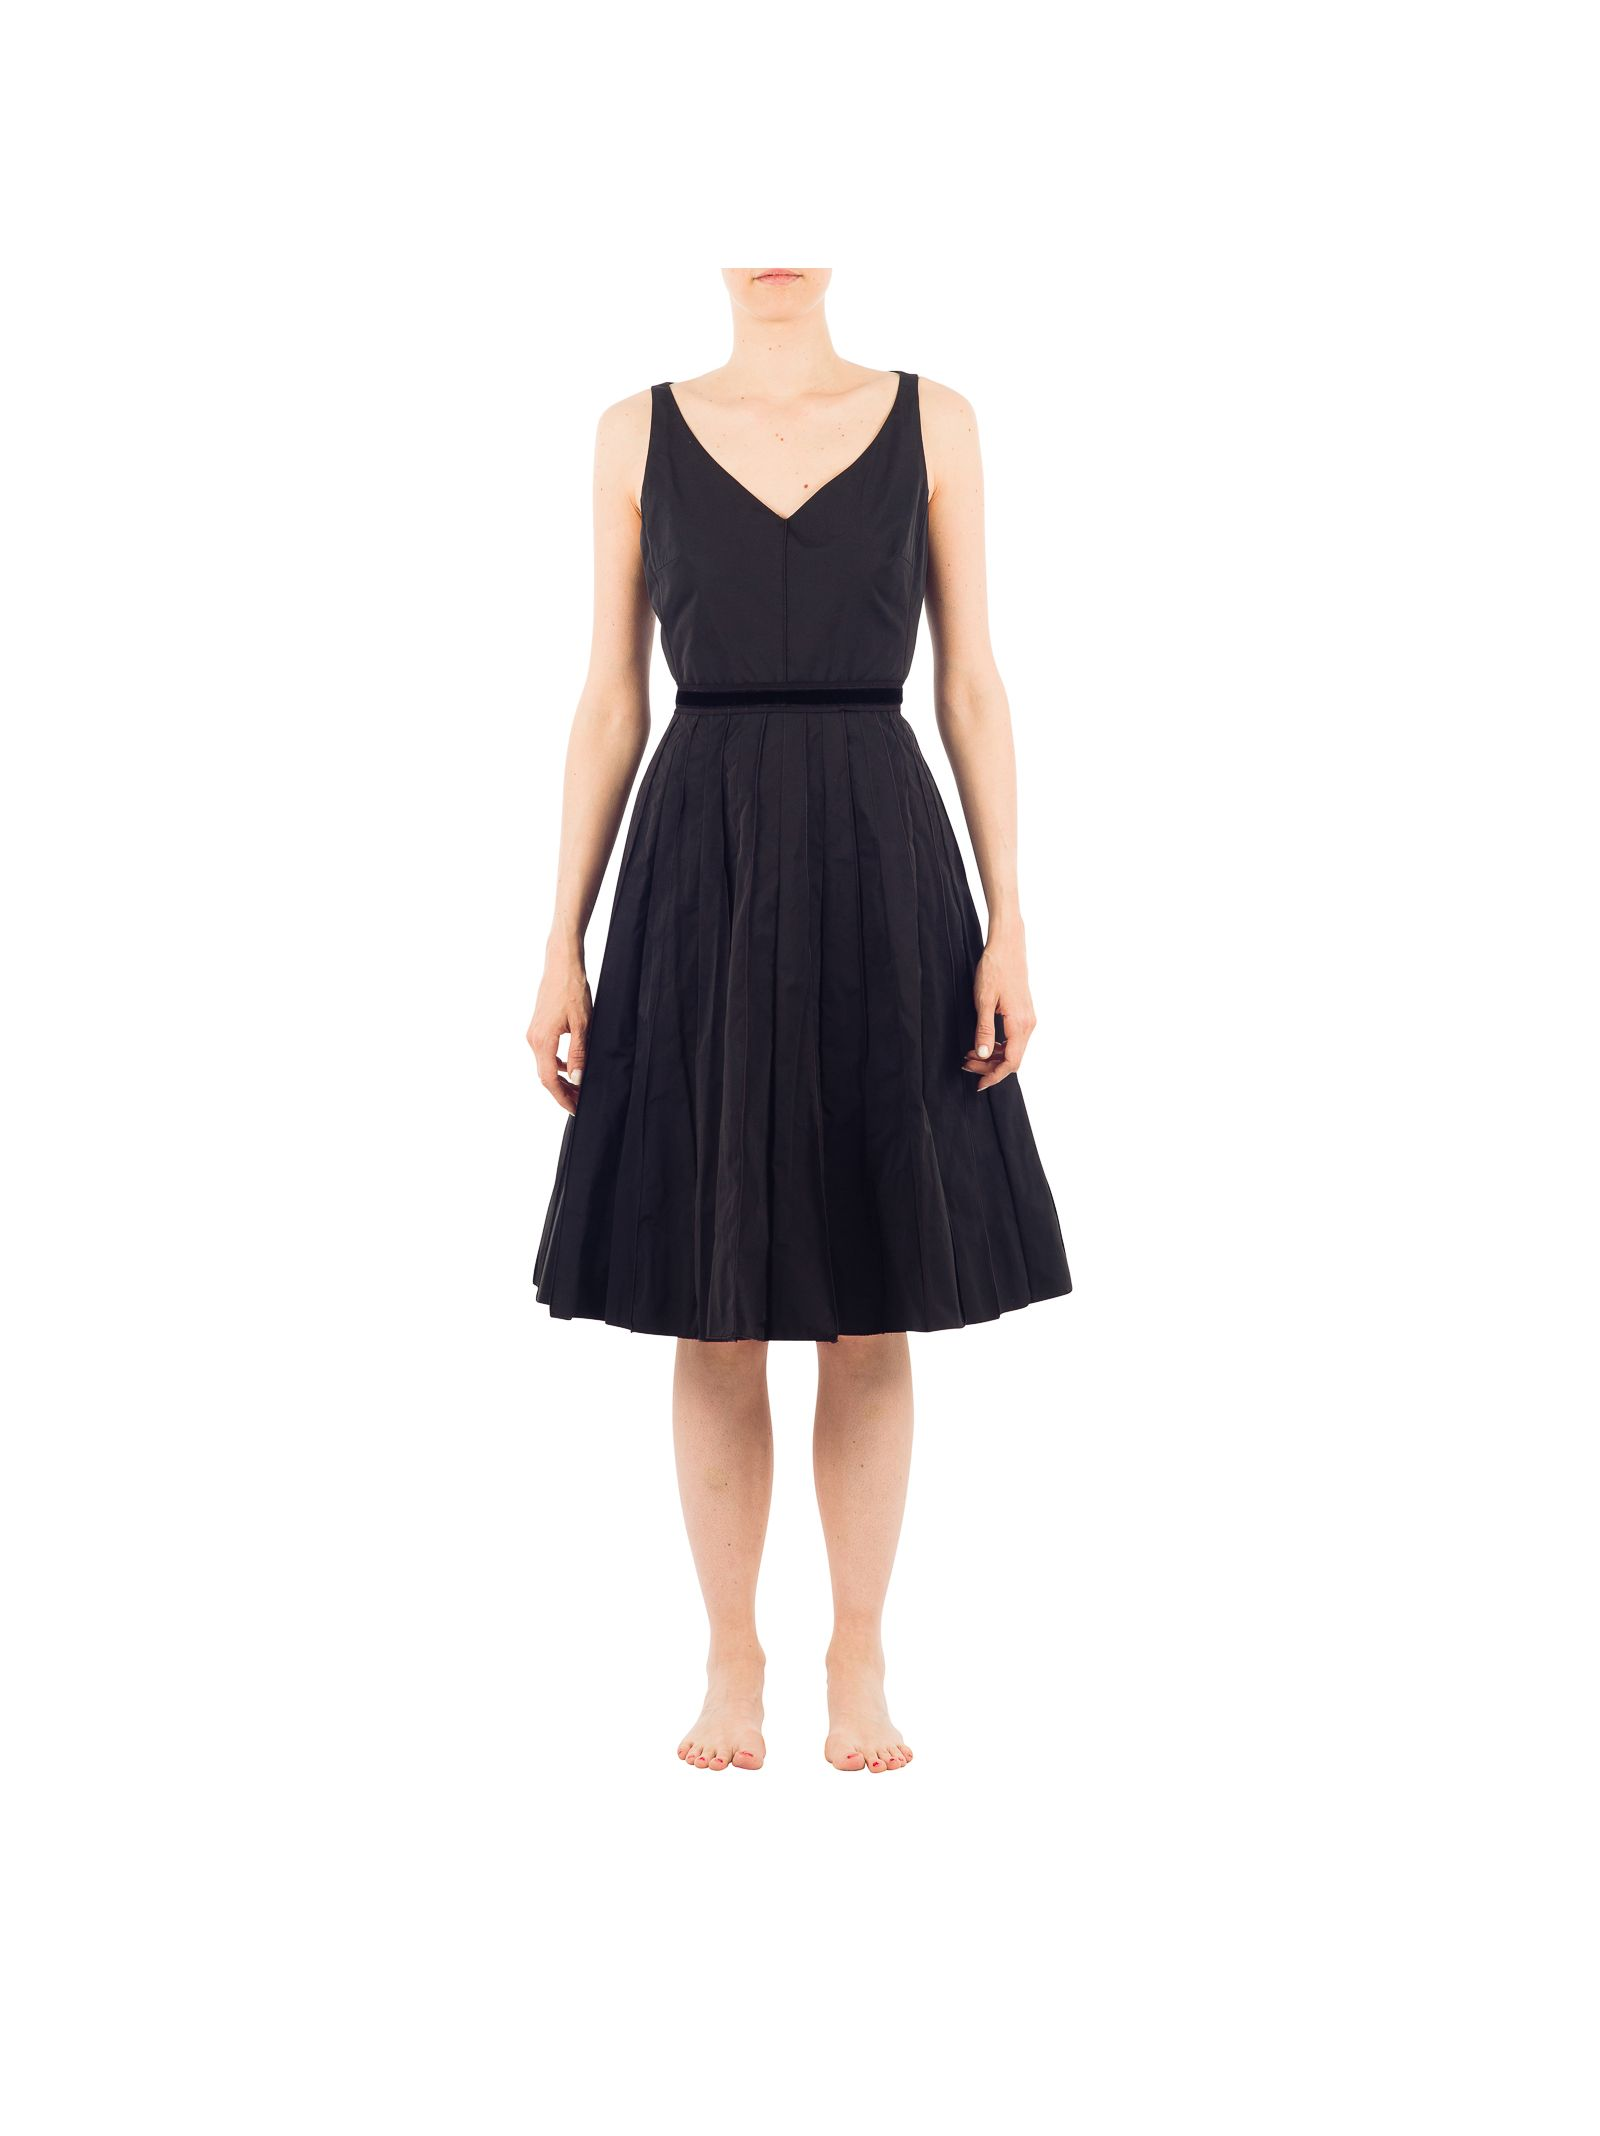 marc jacobs female 188971 marc jacobs black polyester dress